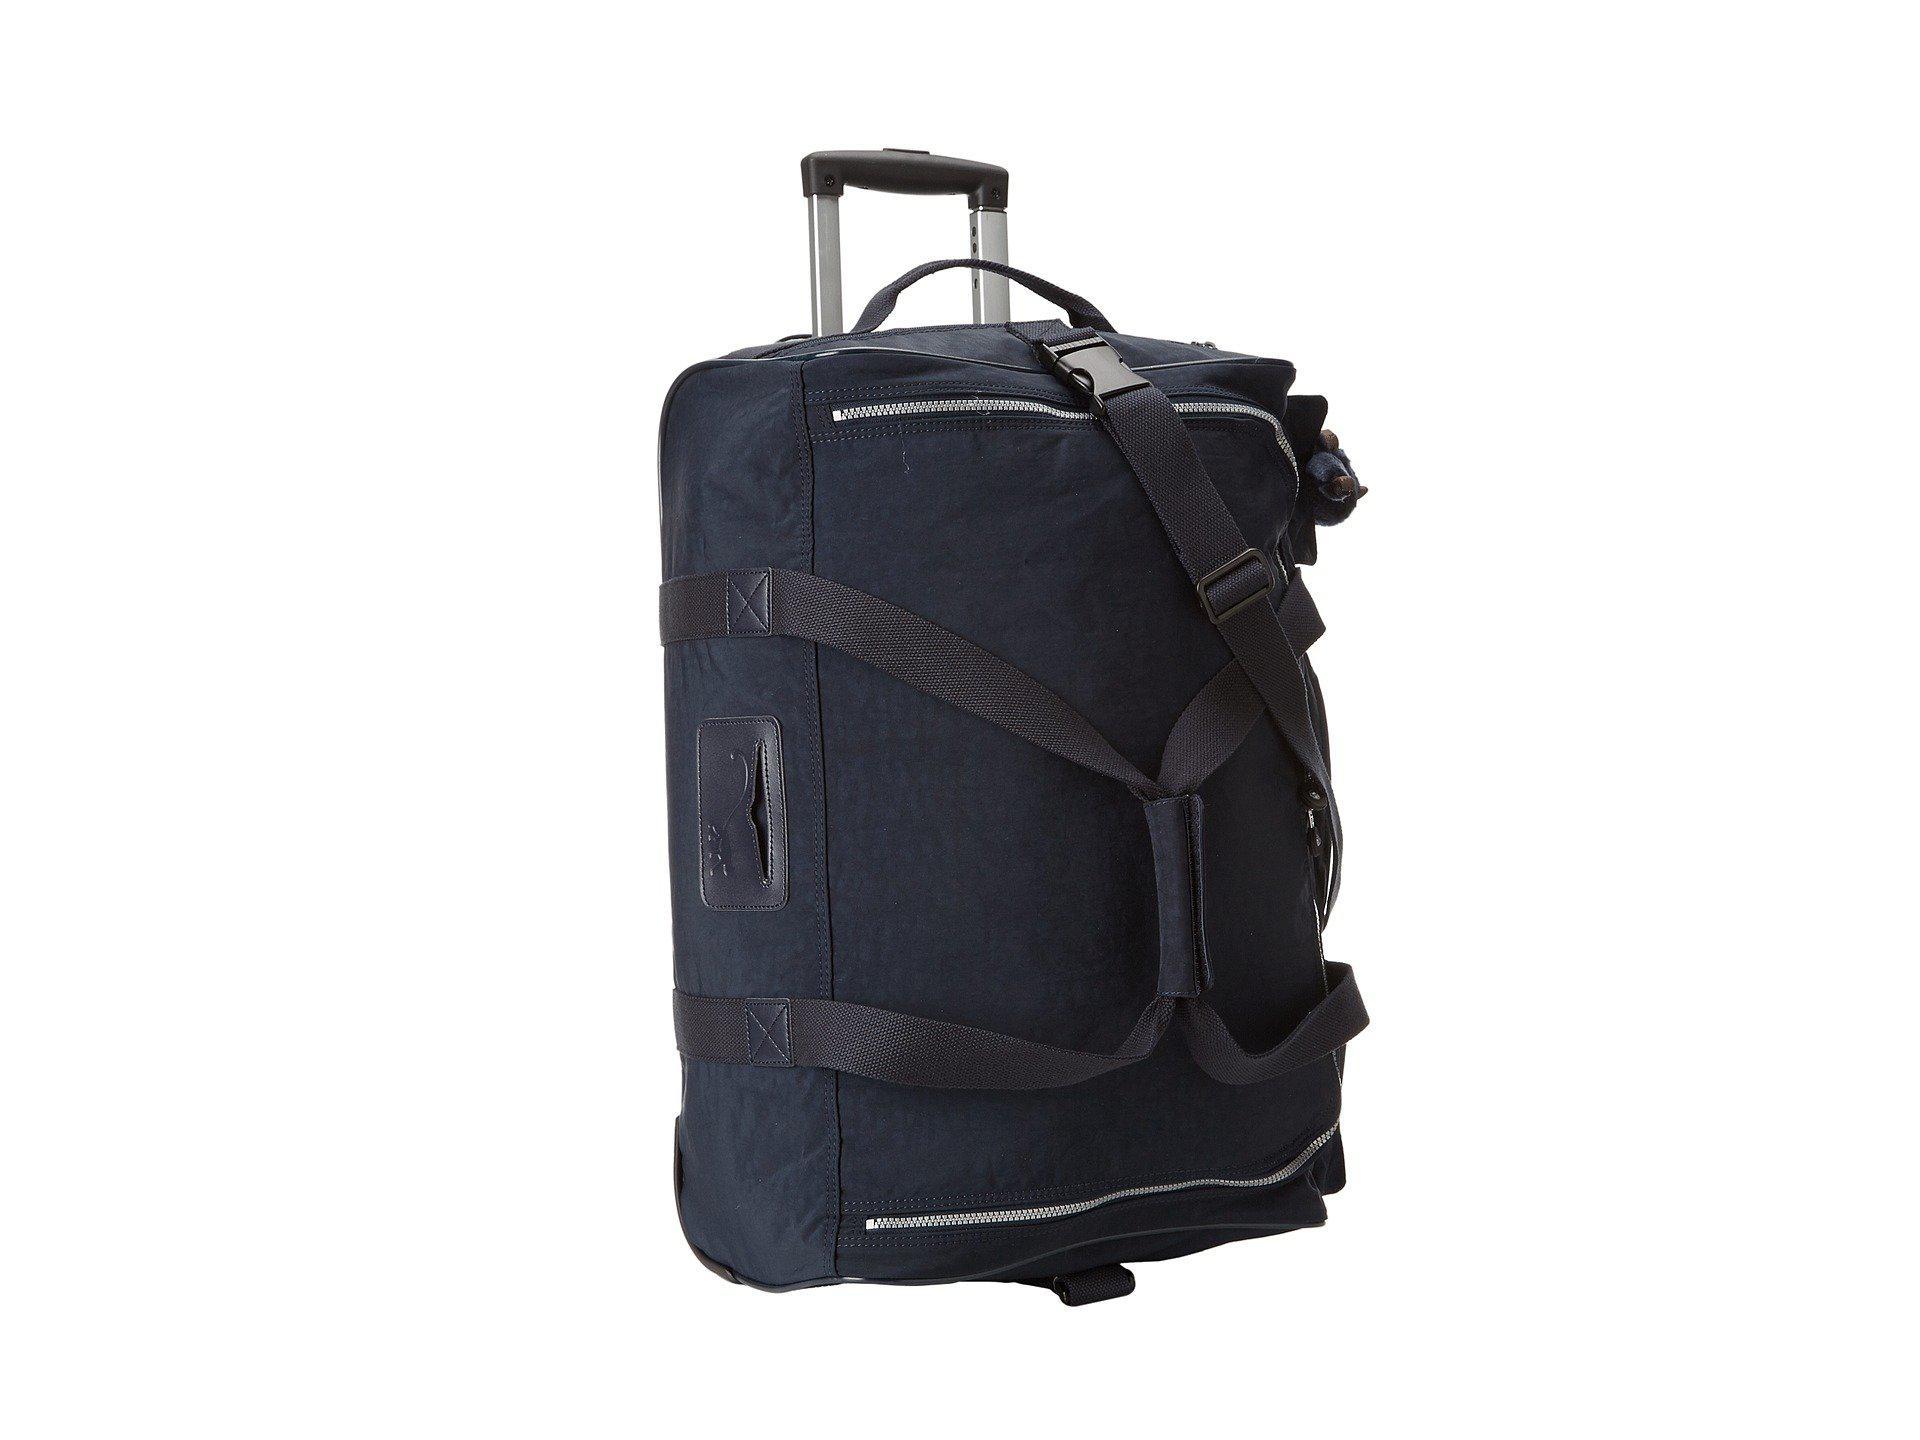 df57fdefc4 Kipling. Women s Discover Small Wheeled Luggage Duffle (true Blue) ...